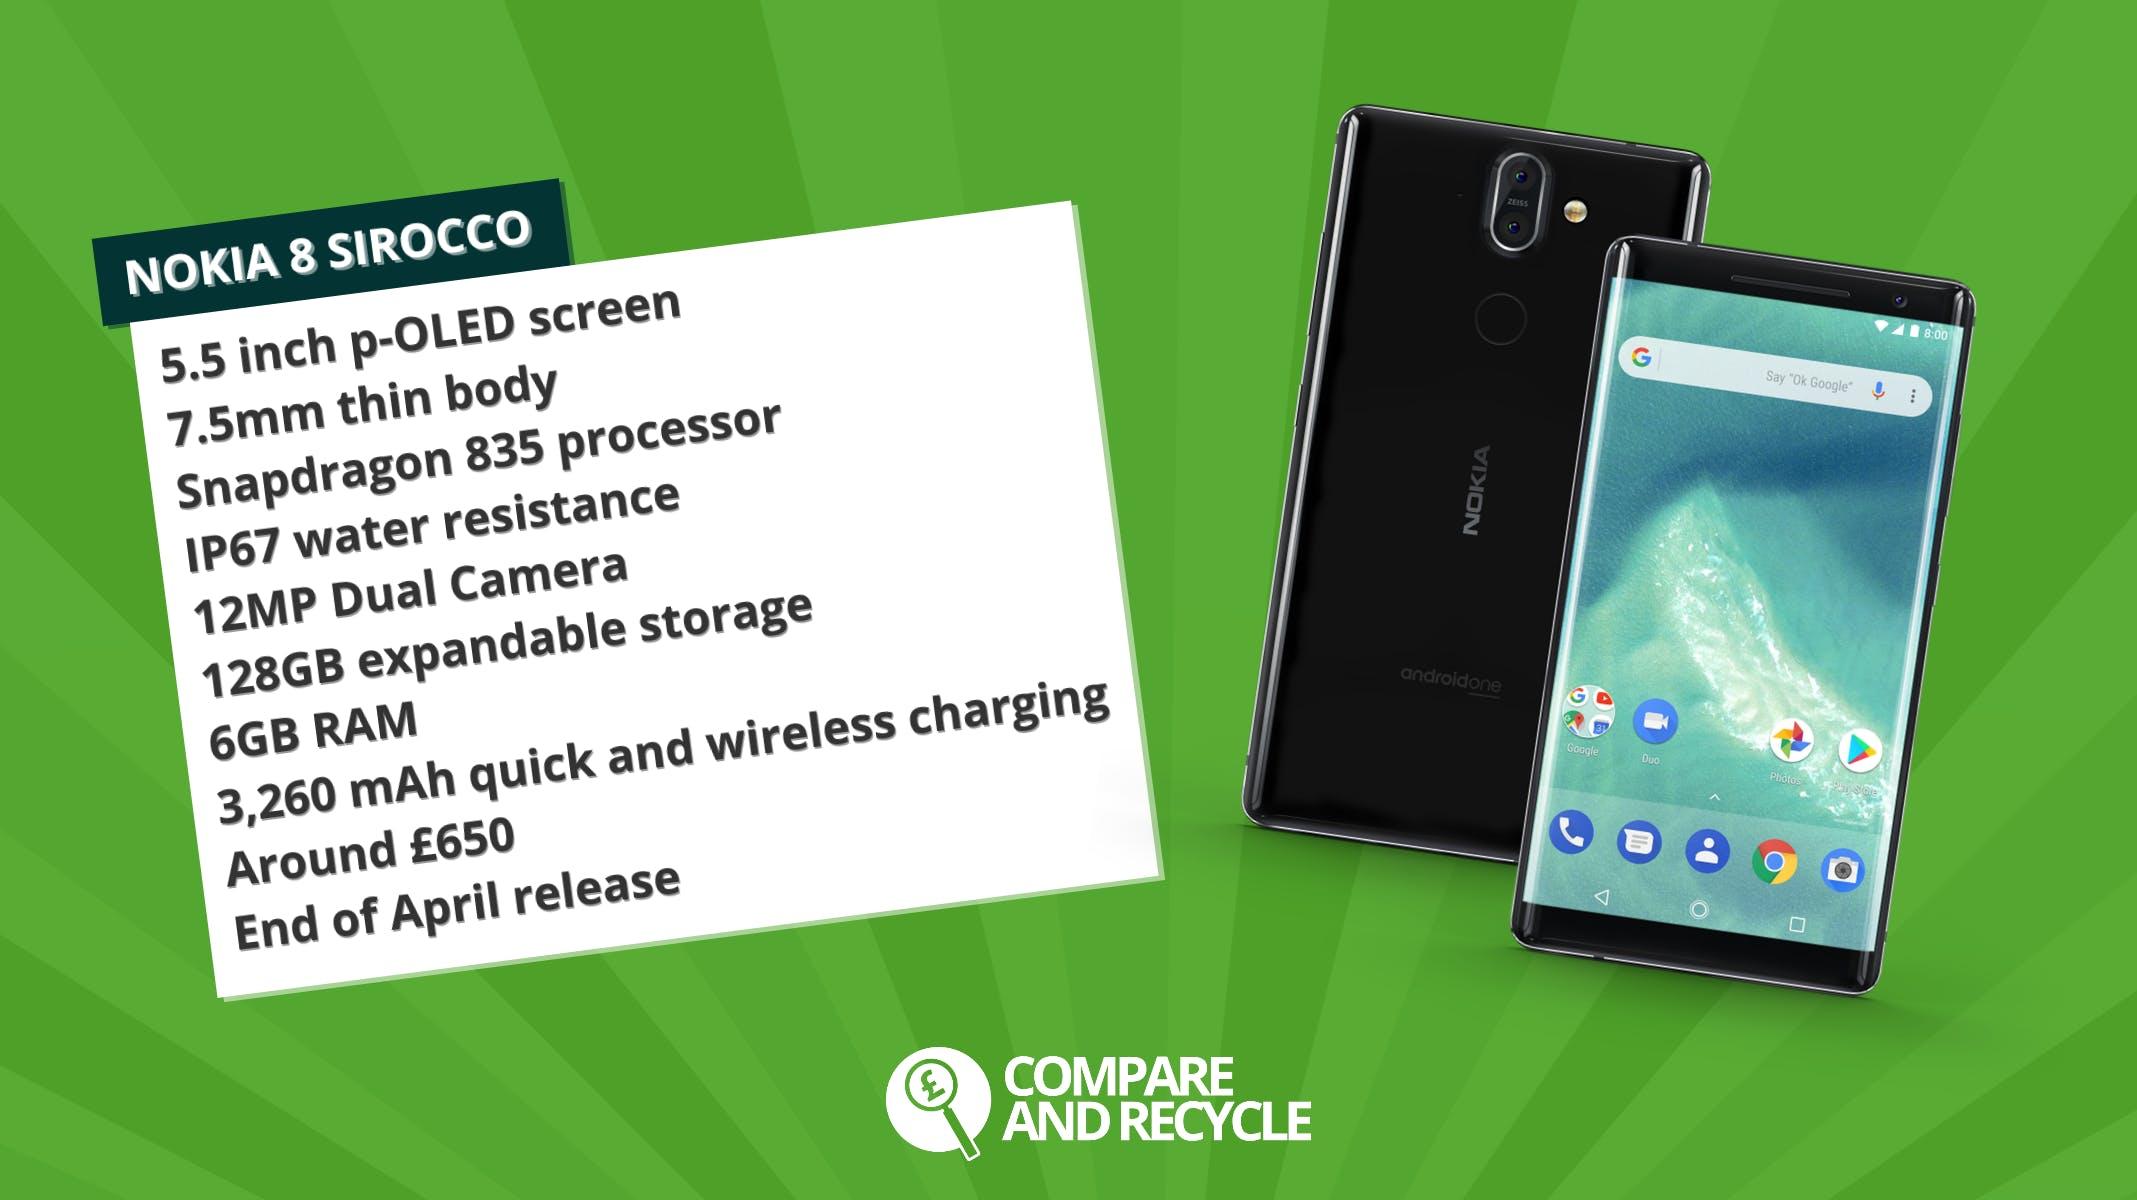 Nokia-8-sirocco-specsheet